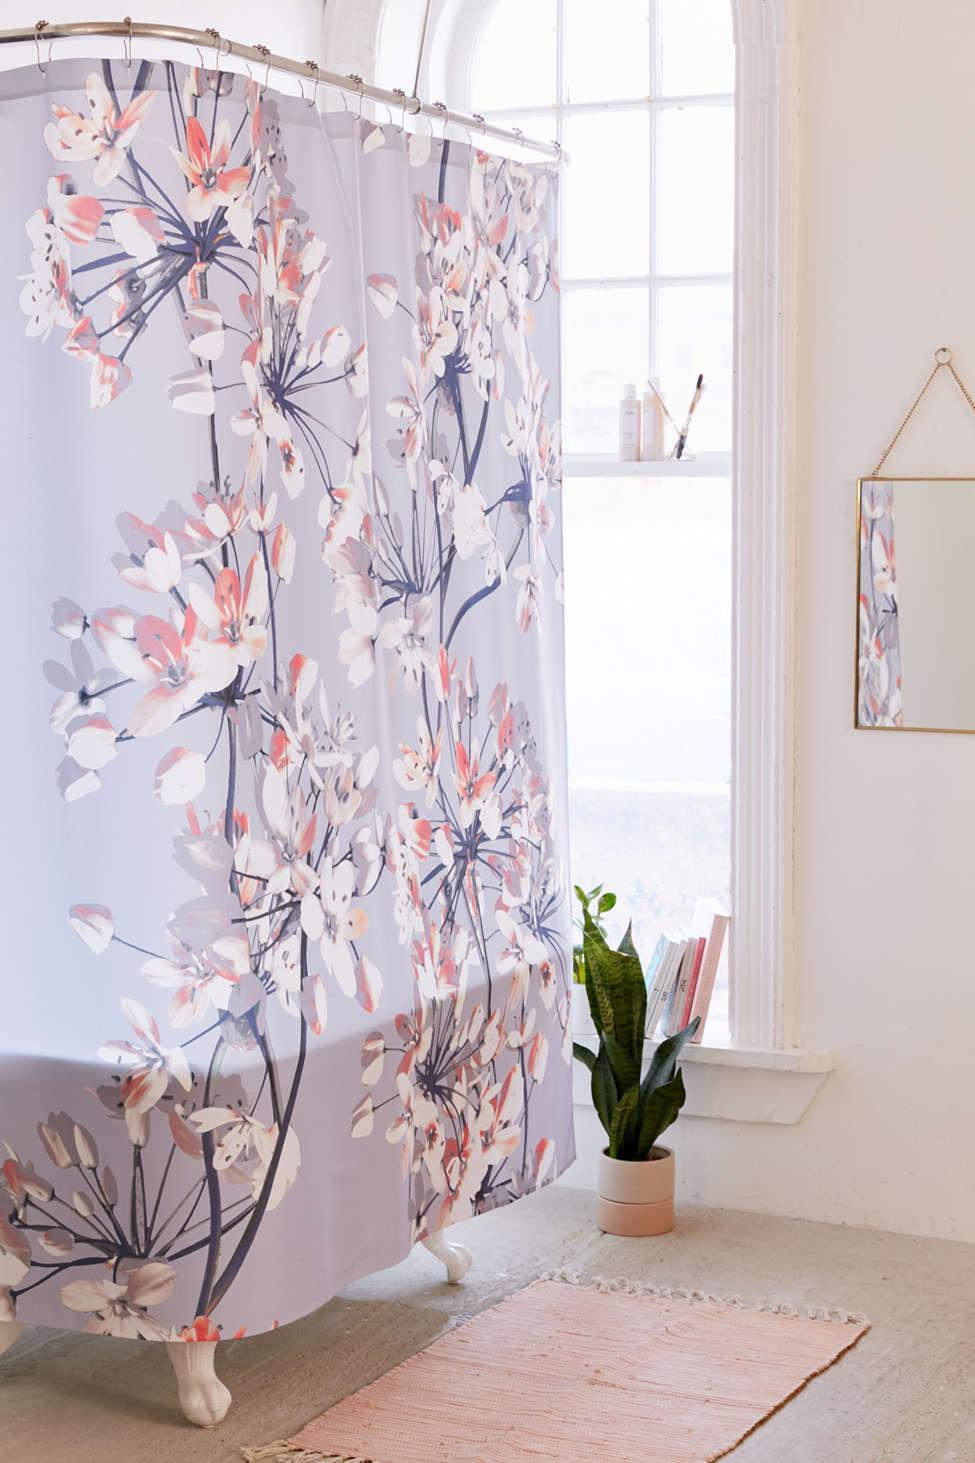 Slide View: 1: Emanuela Carratoni For Deny Delicate Floral Shower Curtain